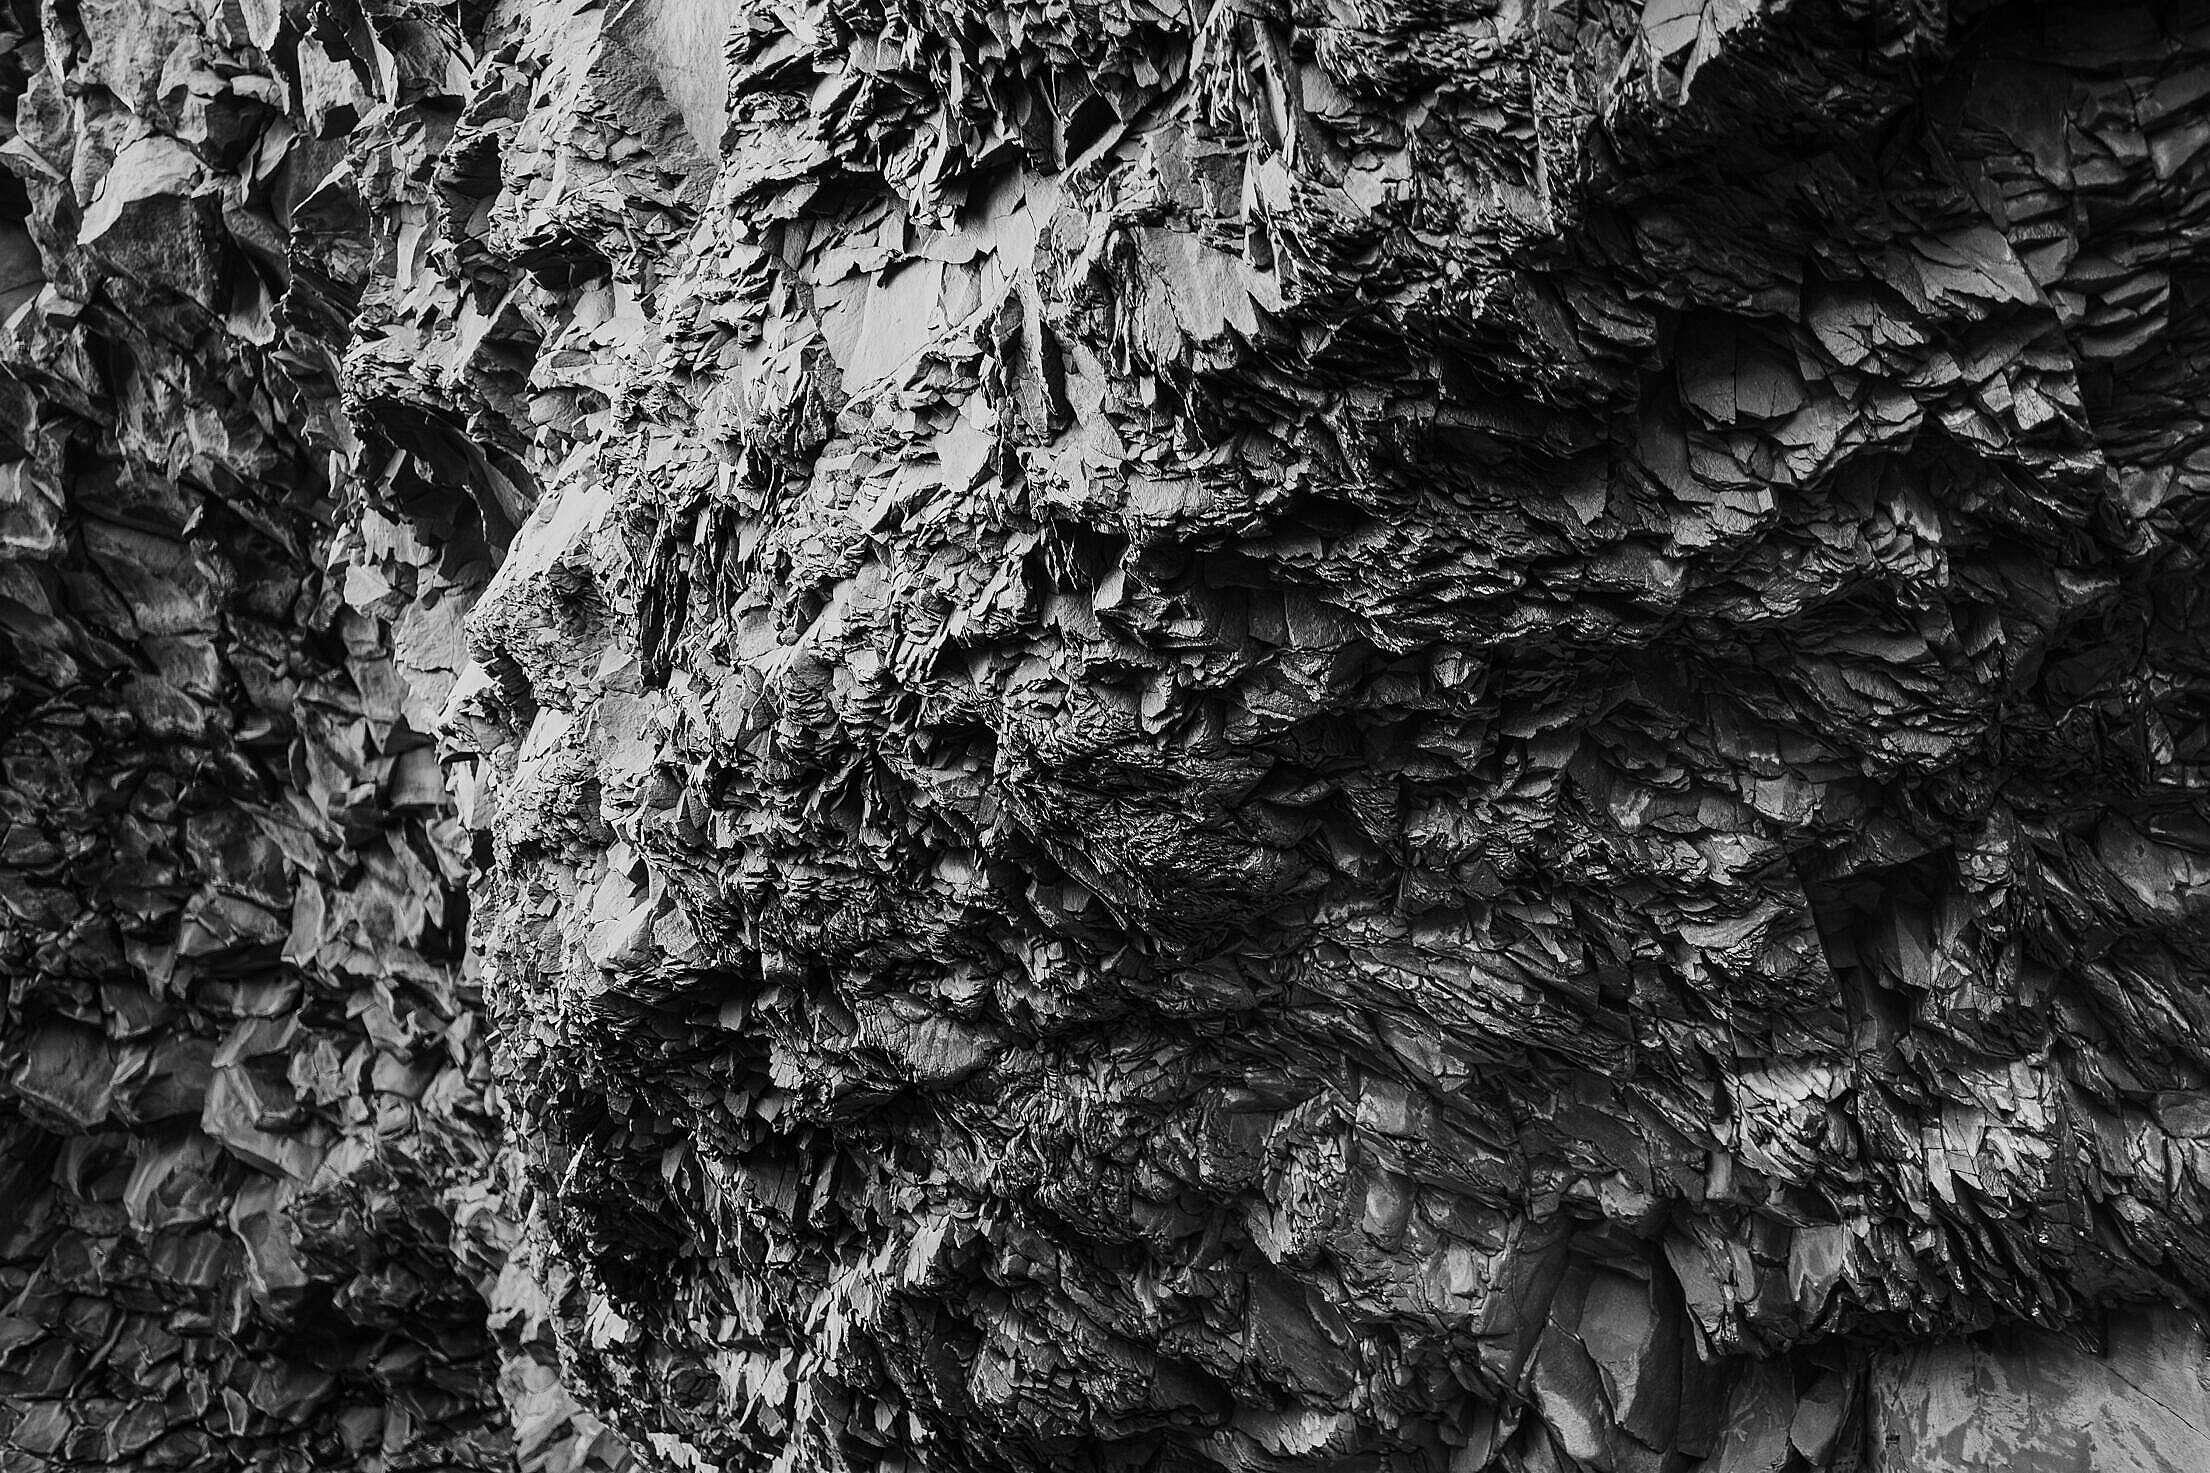 Black Rock Texture Free Stock Photo